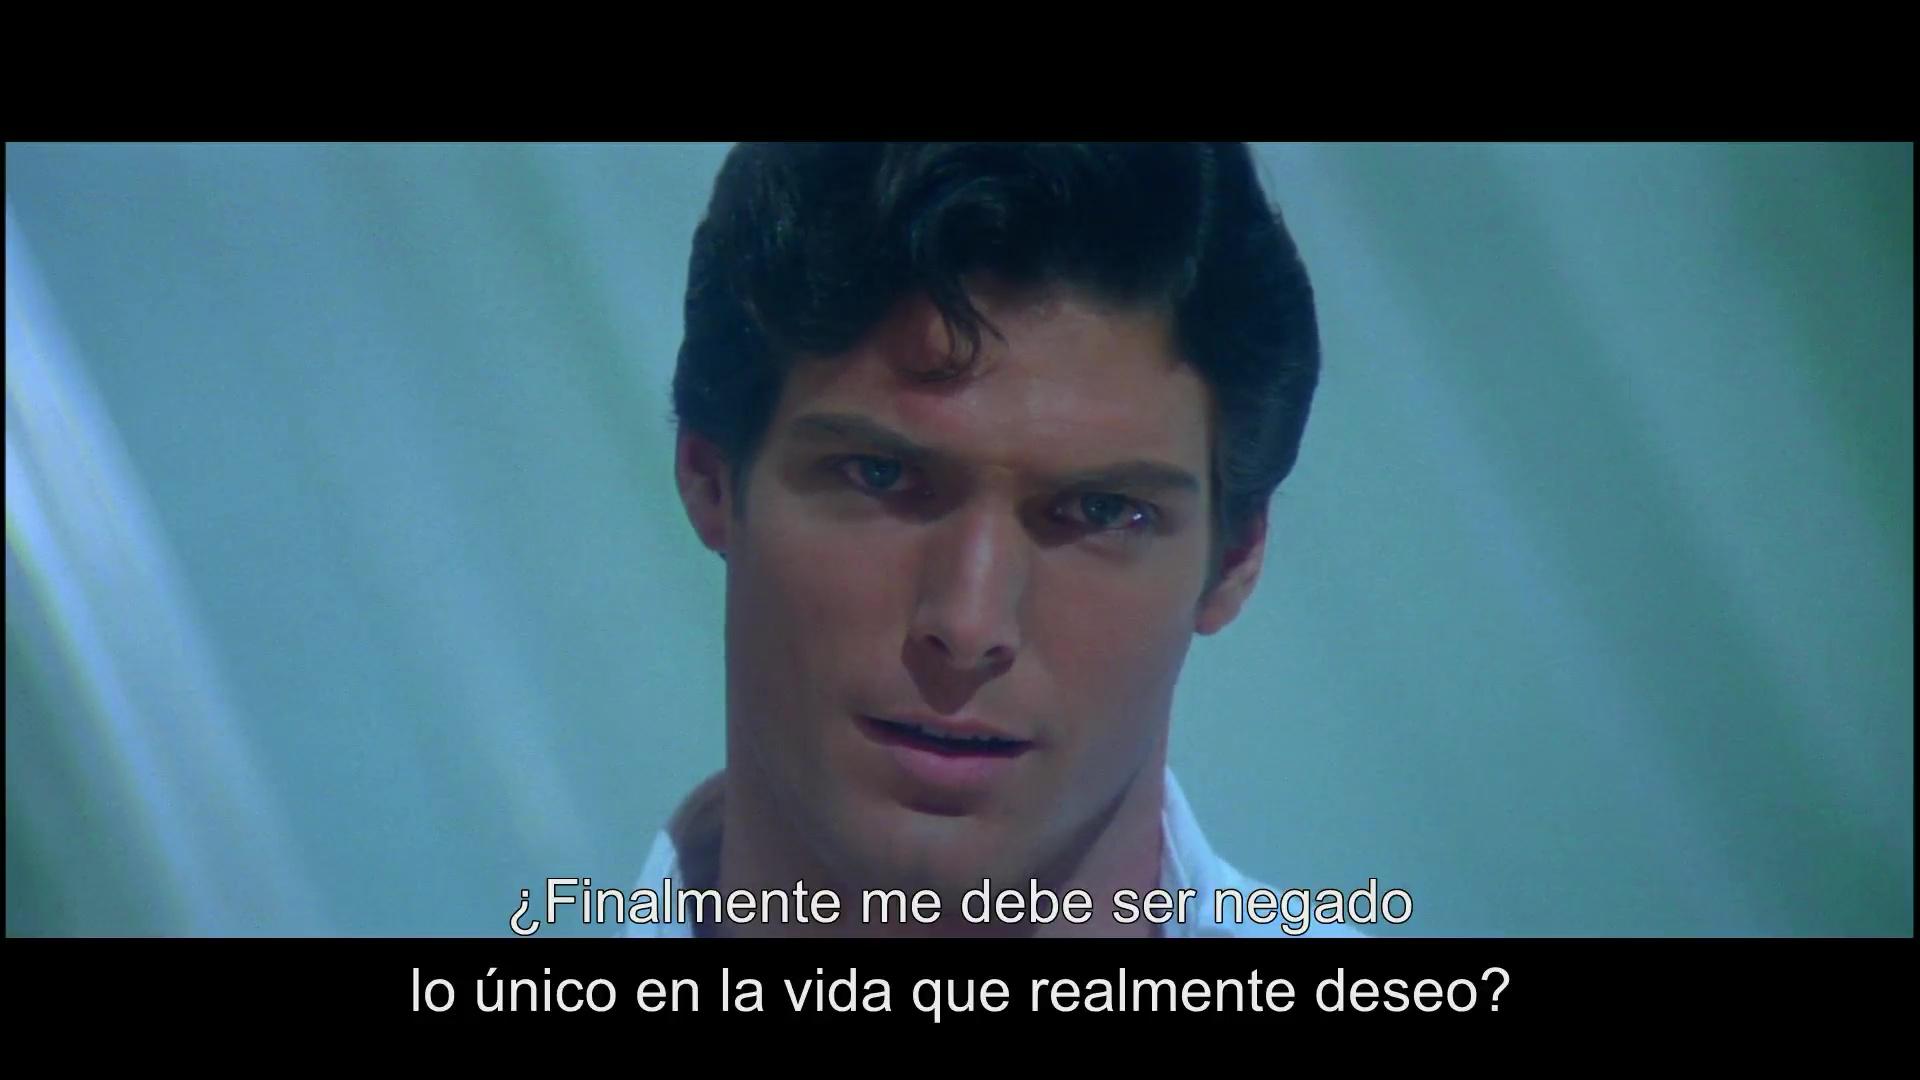 Superman 2 El Montaje De Richard Donner 1080p  Ing-Subs 5.1 (2006)